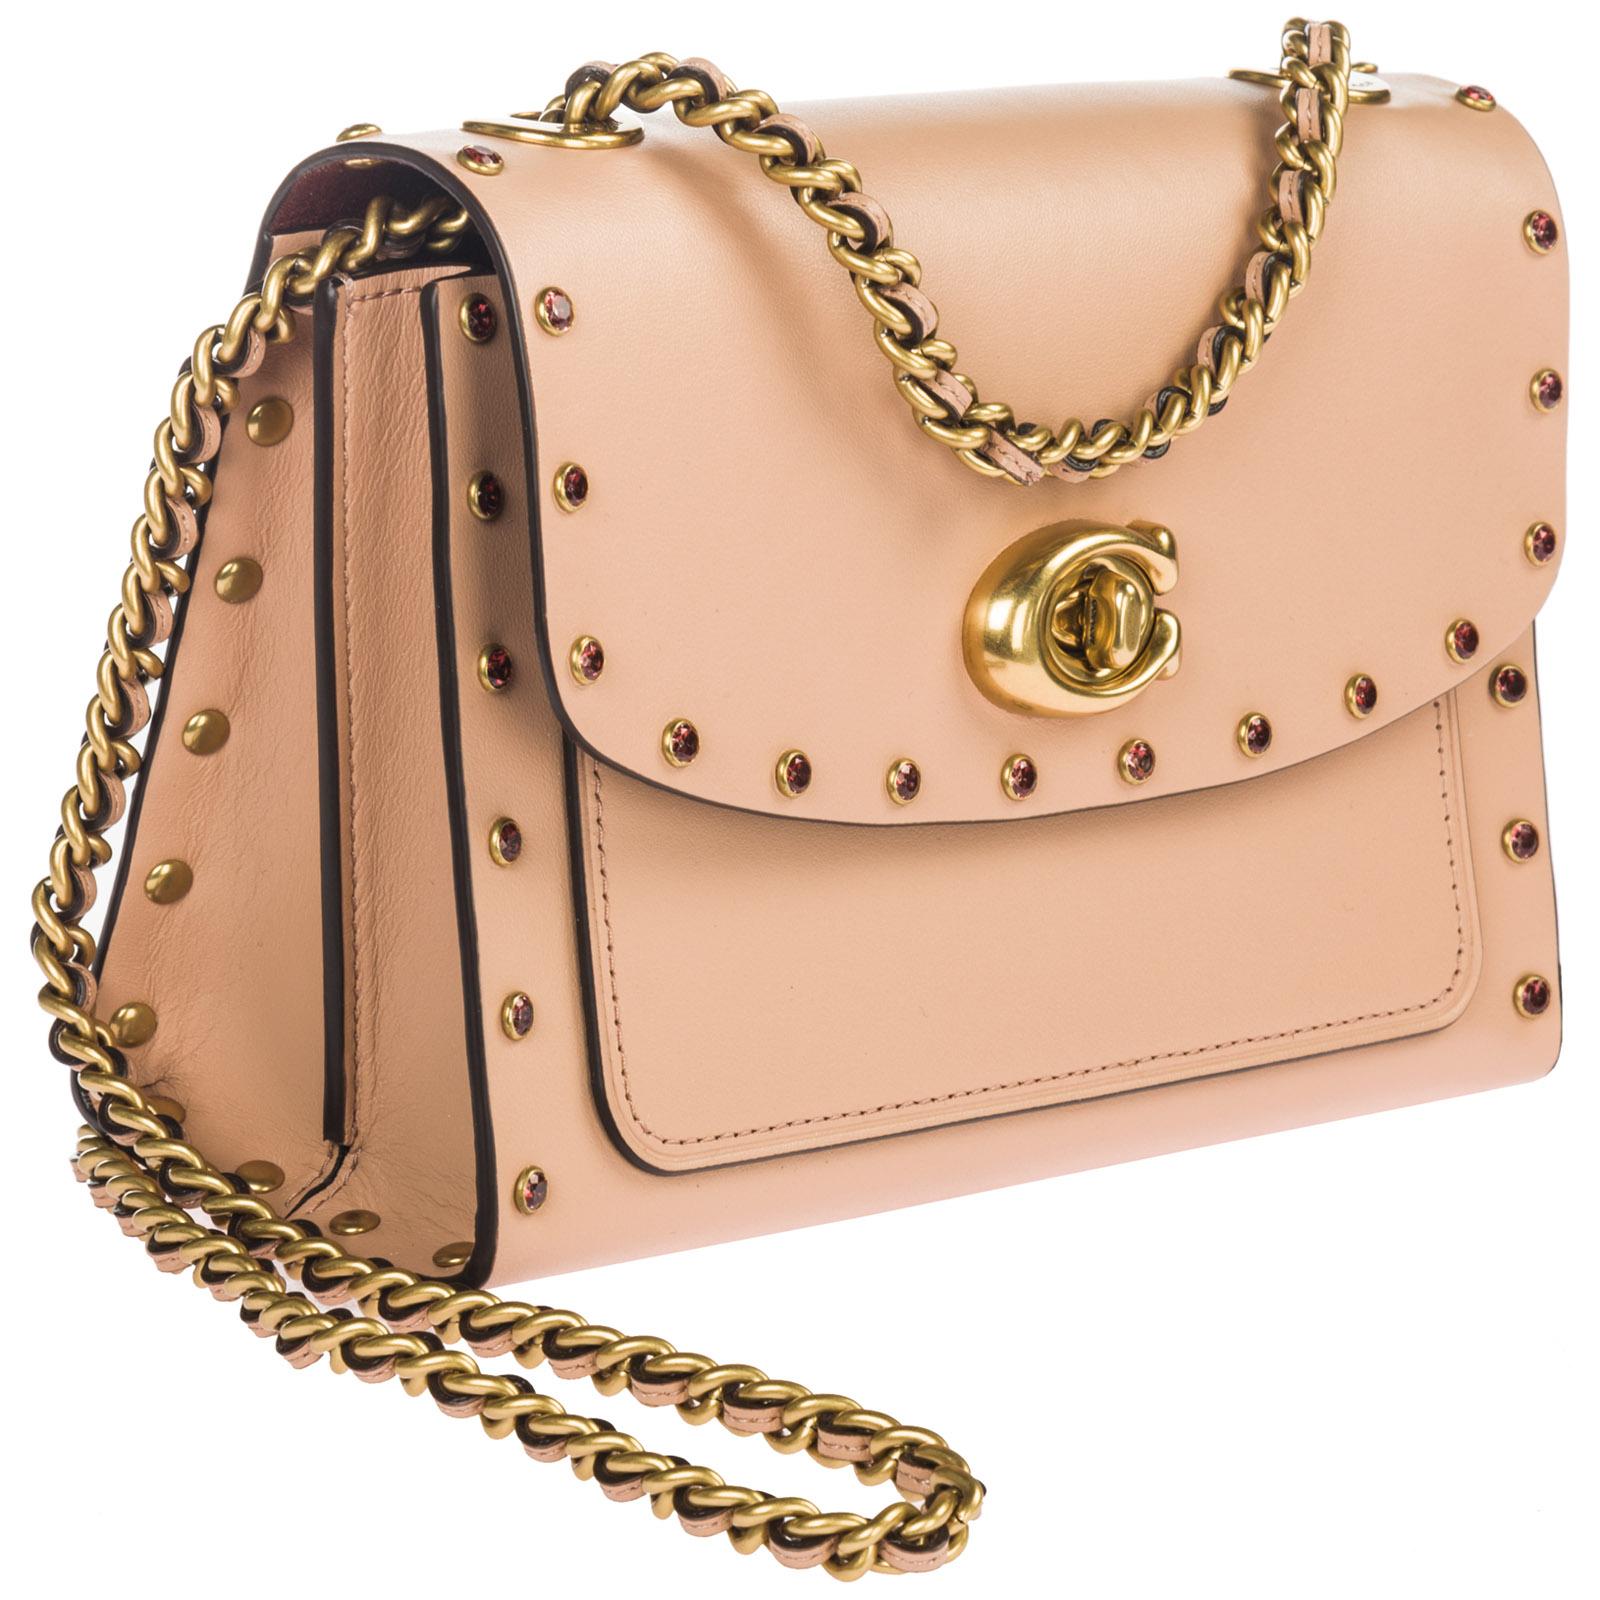 483ac9e1883e ... Women s leather cross-body messenger shoulder bag parker 18 ...